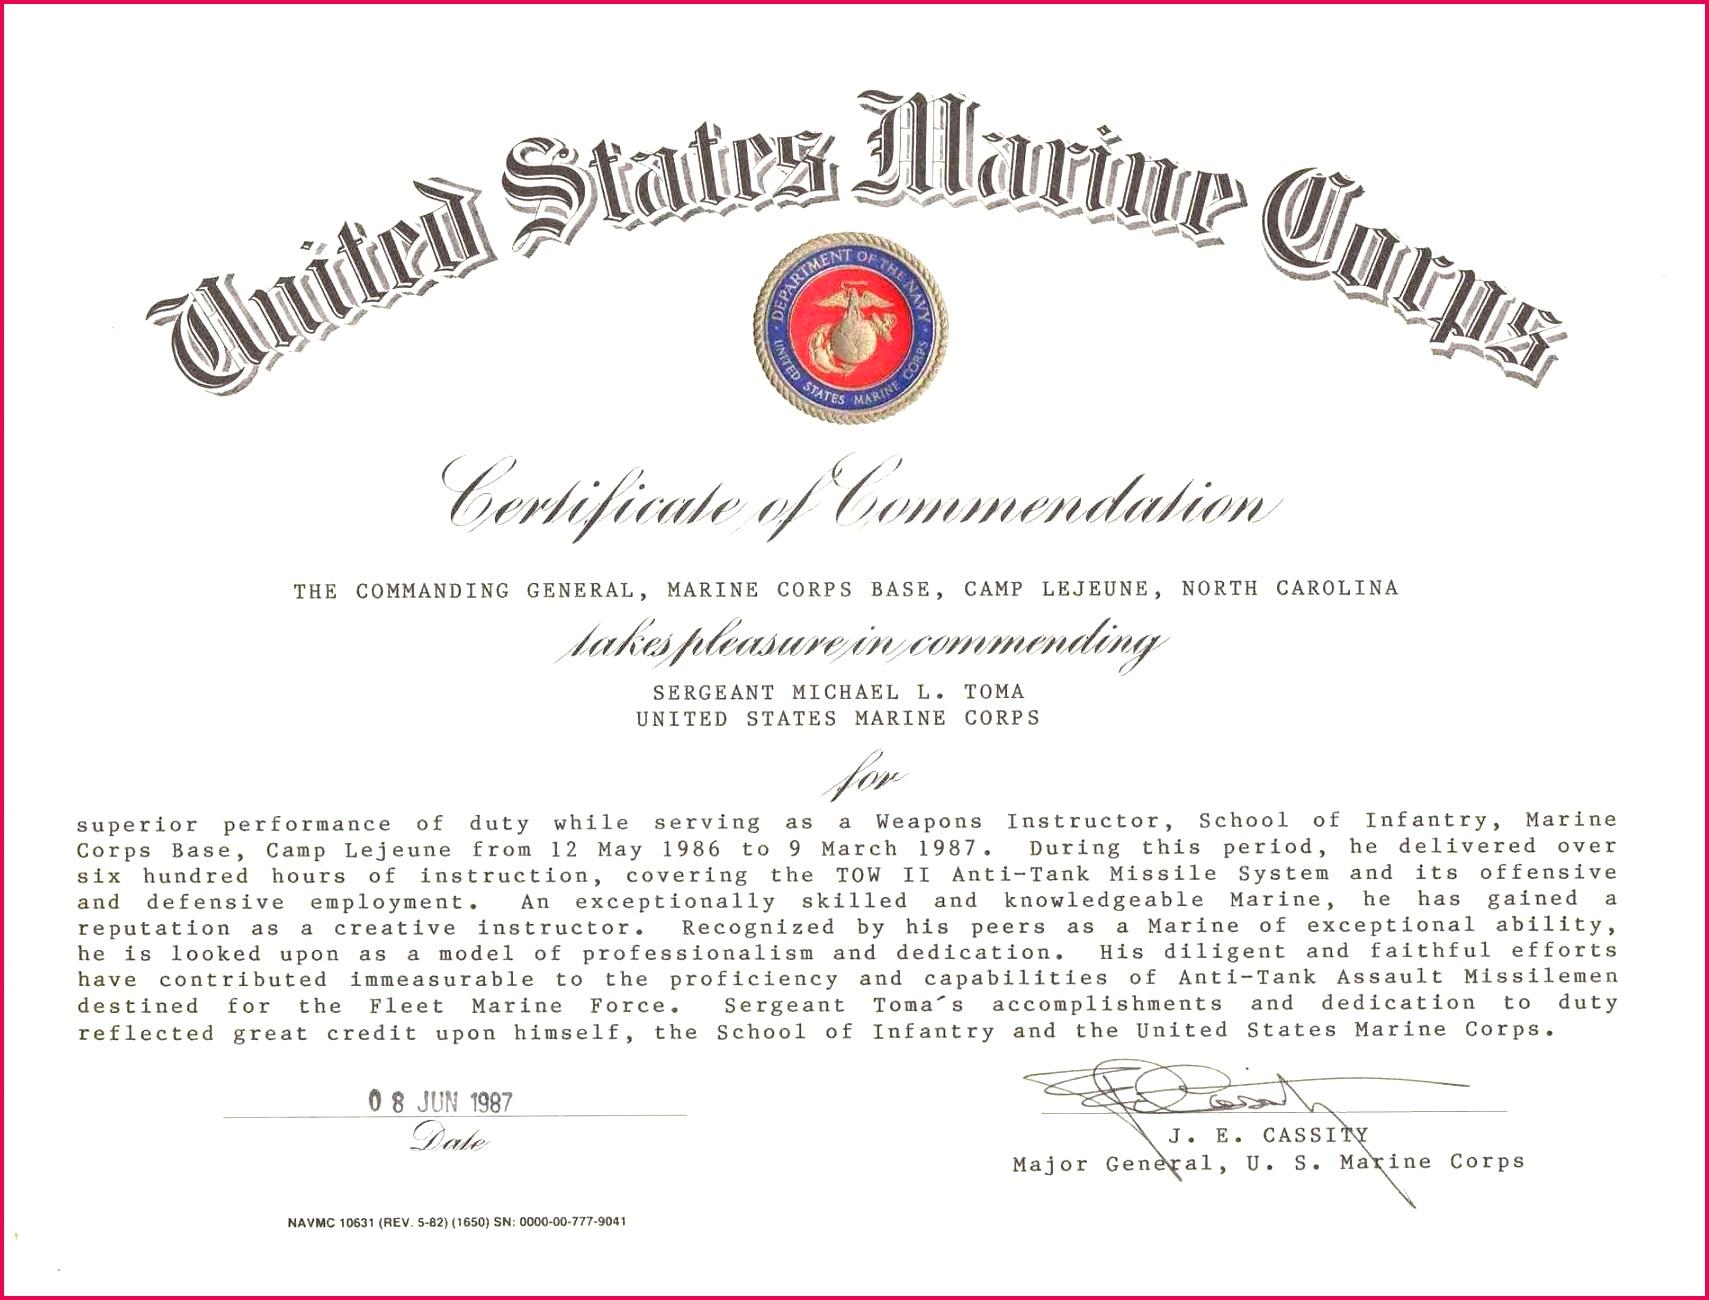 Marine Corps Business Card Holder Beautiful Certificate Mendation Usmc Template top Usmc Business Card